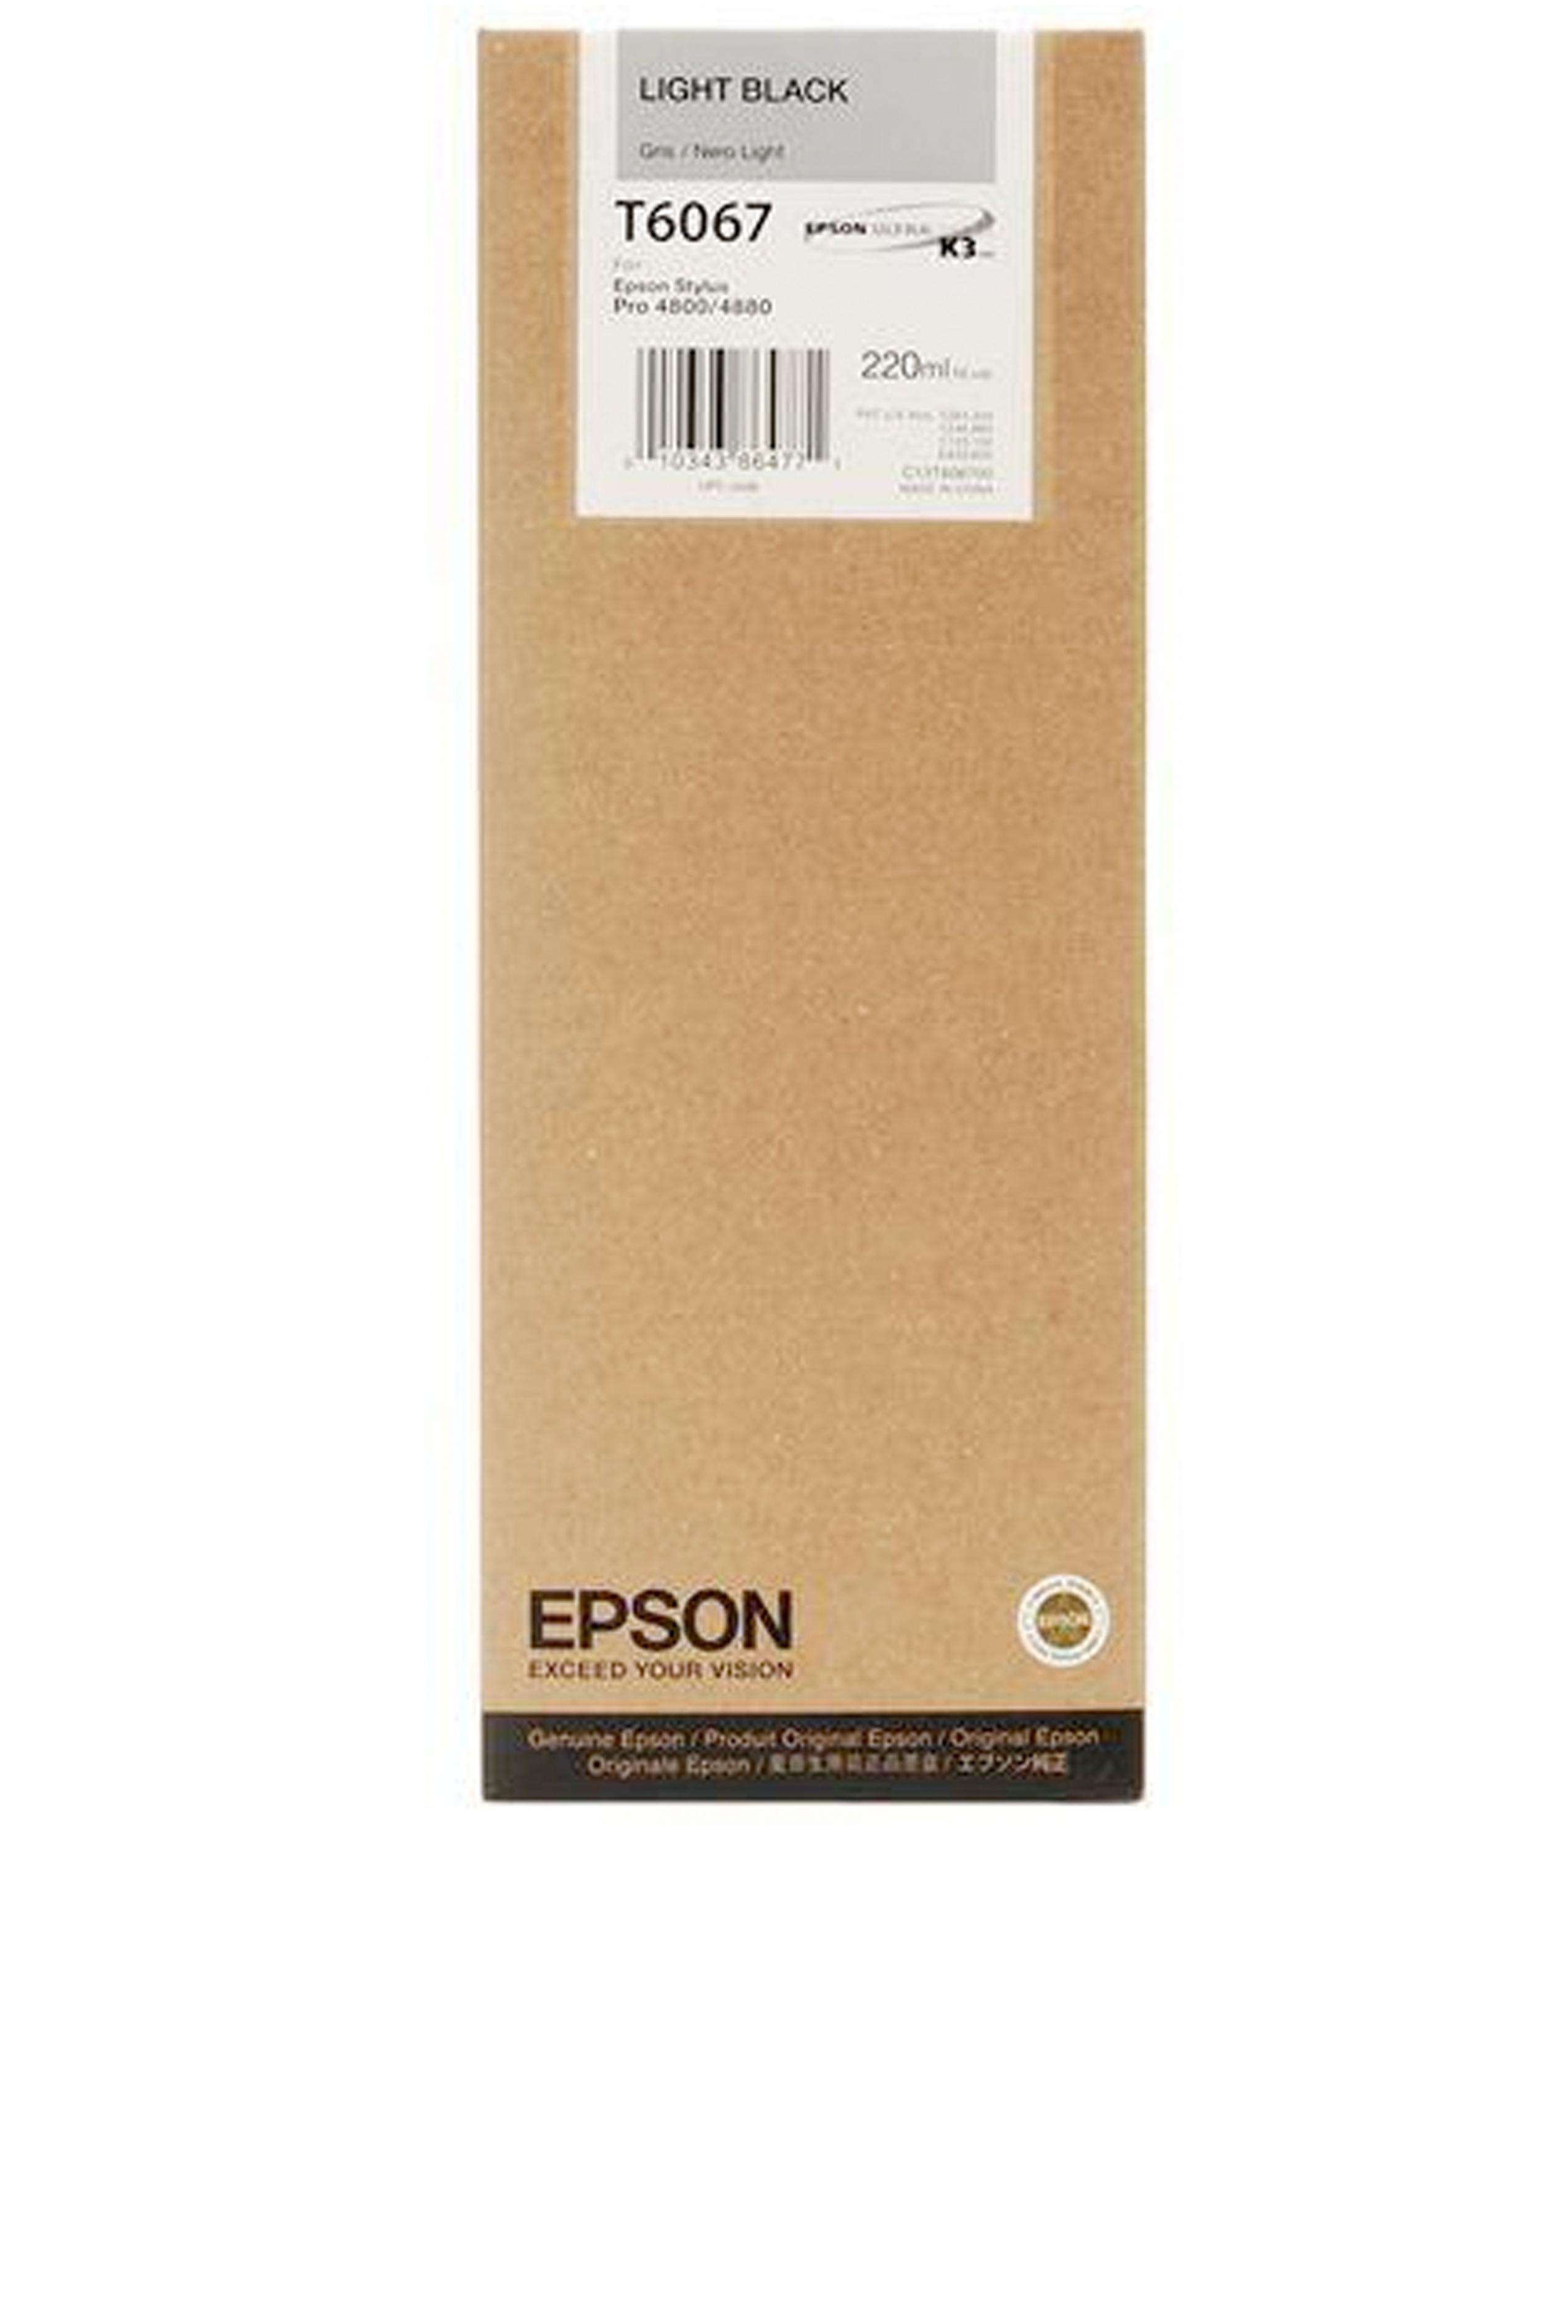 Epson EPSON HI LT BLACK INK (220 ML) (T606700)